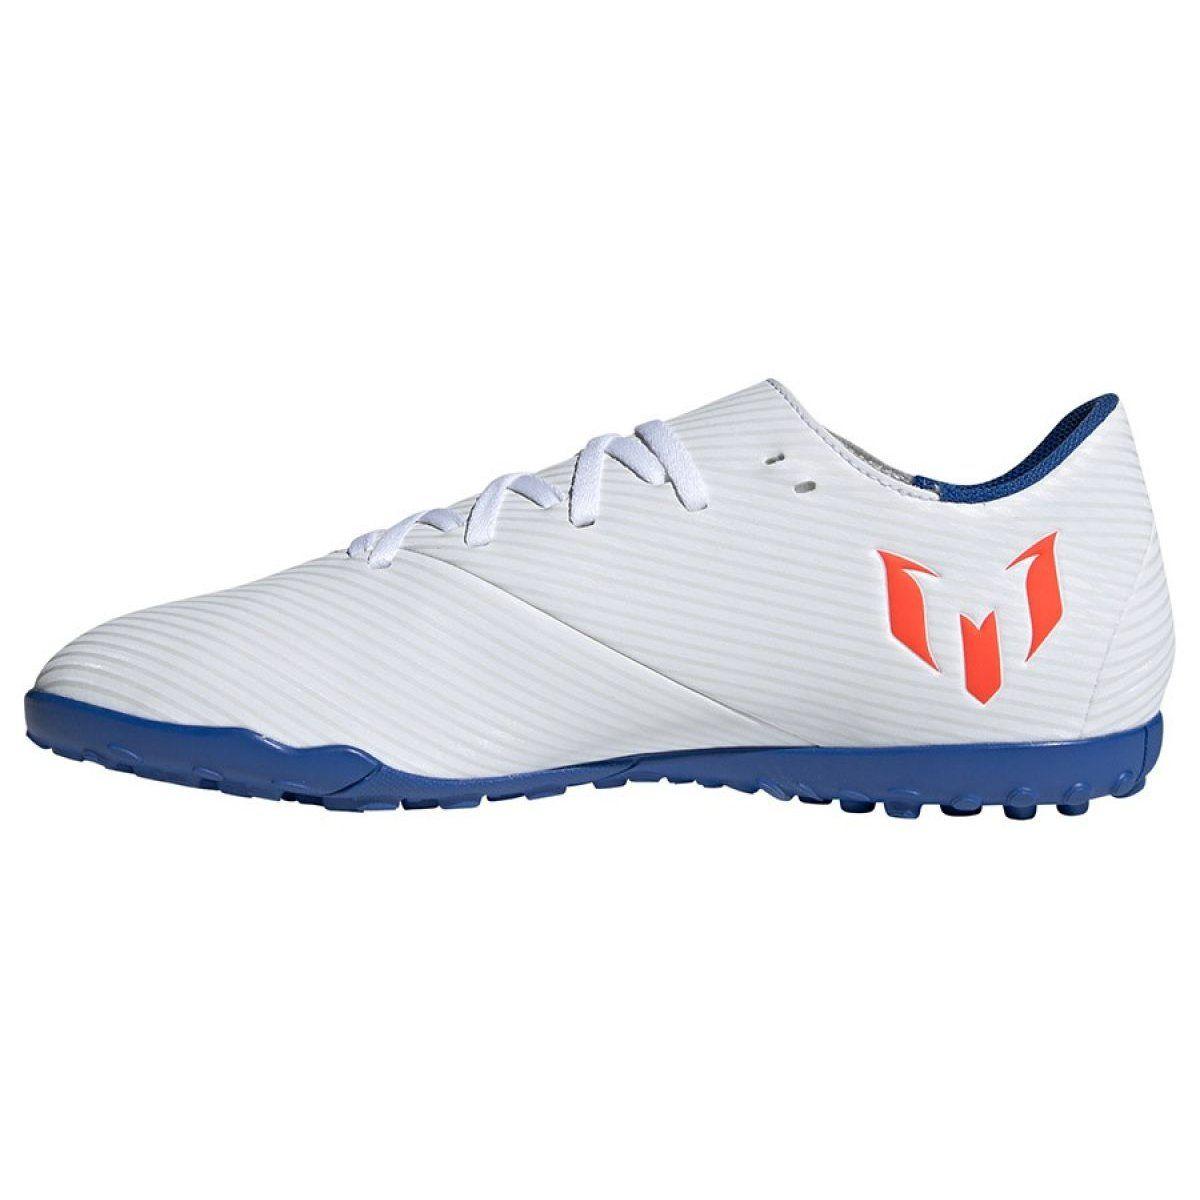 Football Boots Adidas Nemeziz Messi 19 4 Tf M F34549 White Multicolored Football Boots Messi Football Shoes Adidas Brand